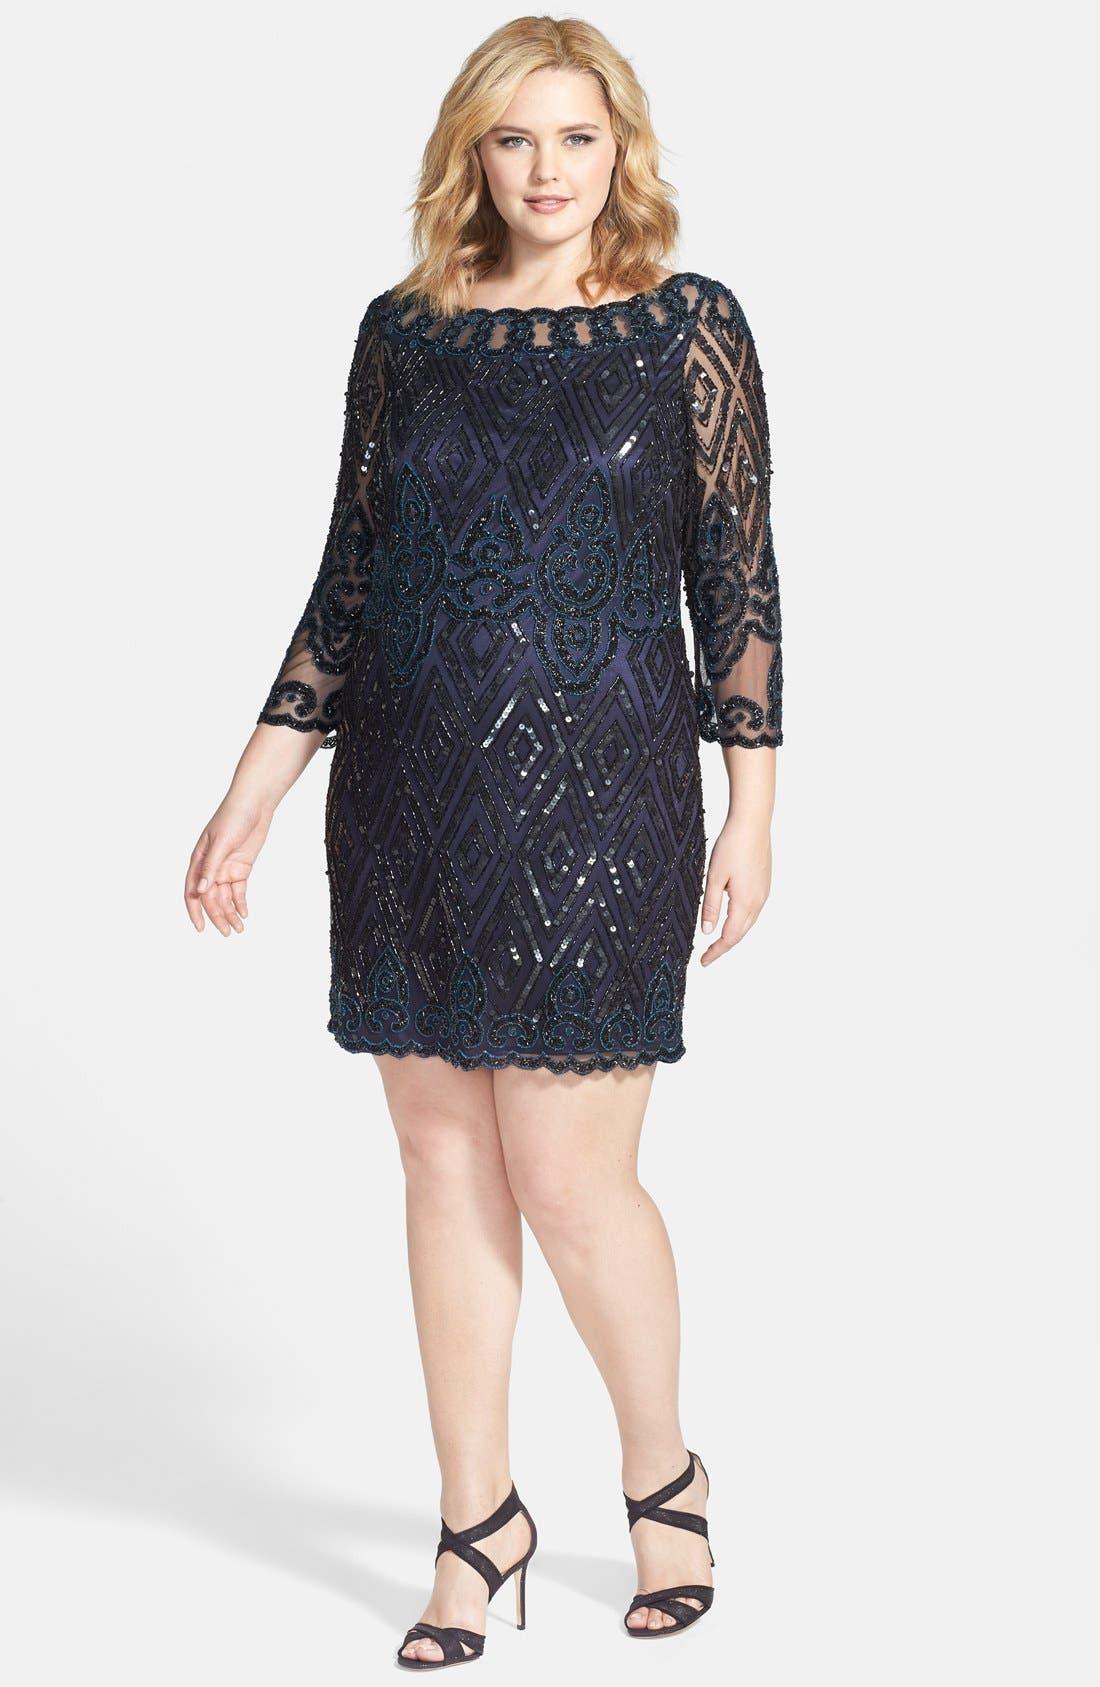 Alternate Image 1 Selected - Pisarro Nights Embellished Short Cocktail Dress (Plus Size)